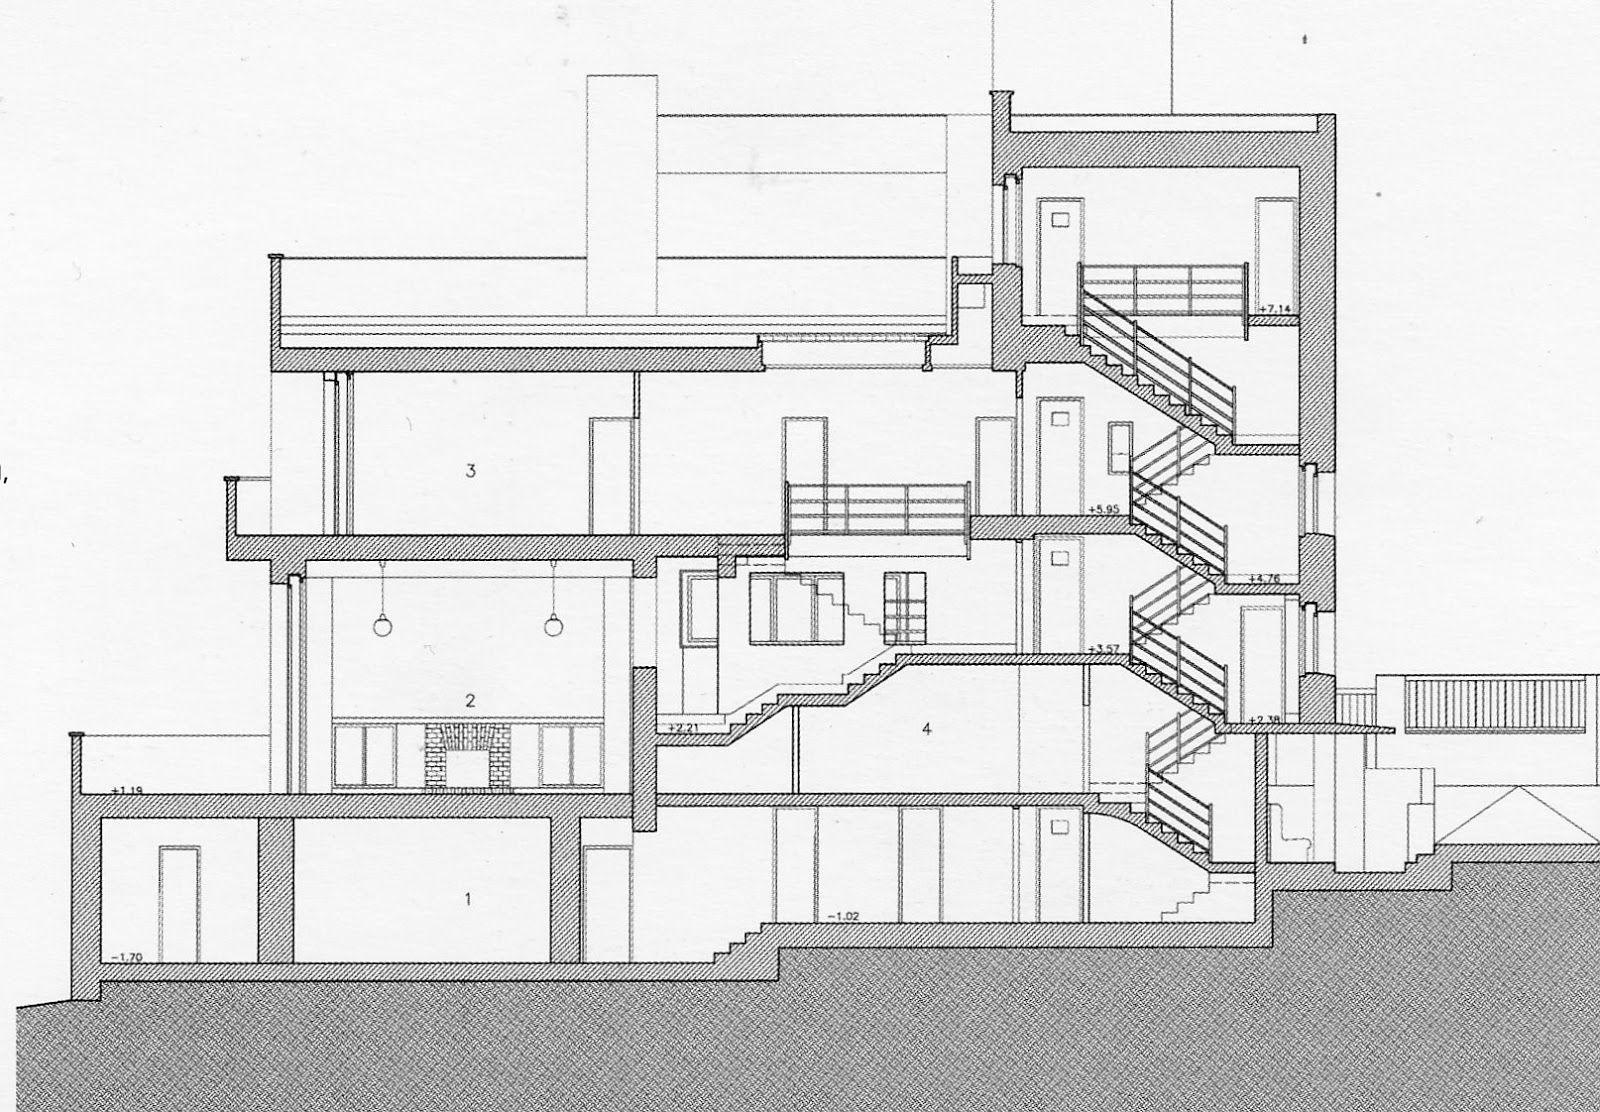 villa m ller adolf loos casos de estudio pinterest villas architecture and modern. Black Bedroom Furniture Sets. Home Design Ideas